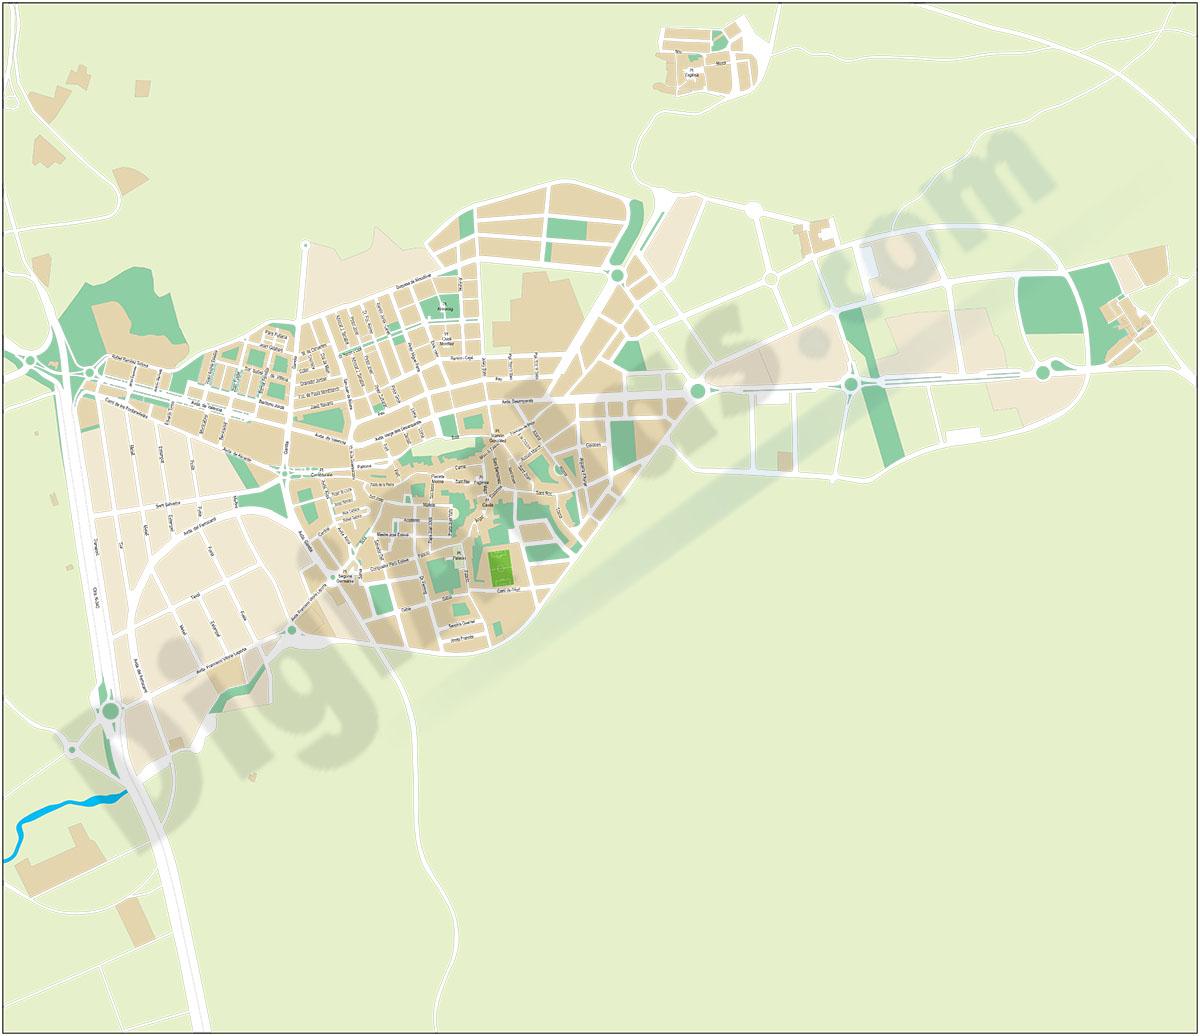 Muro de Alcoy-Alcoi (Alicante) - city map